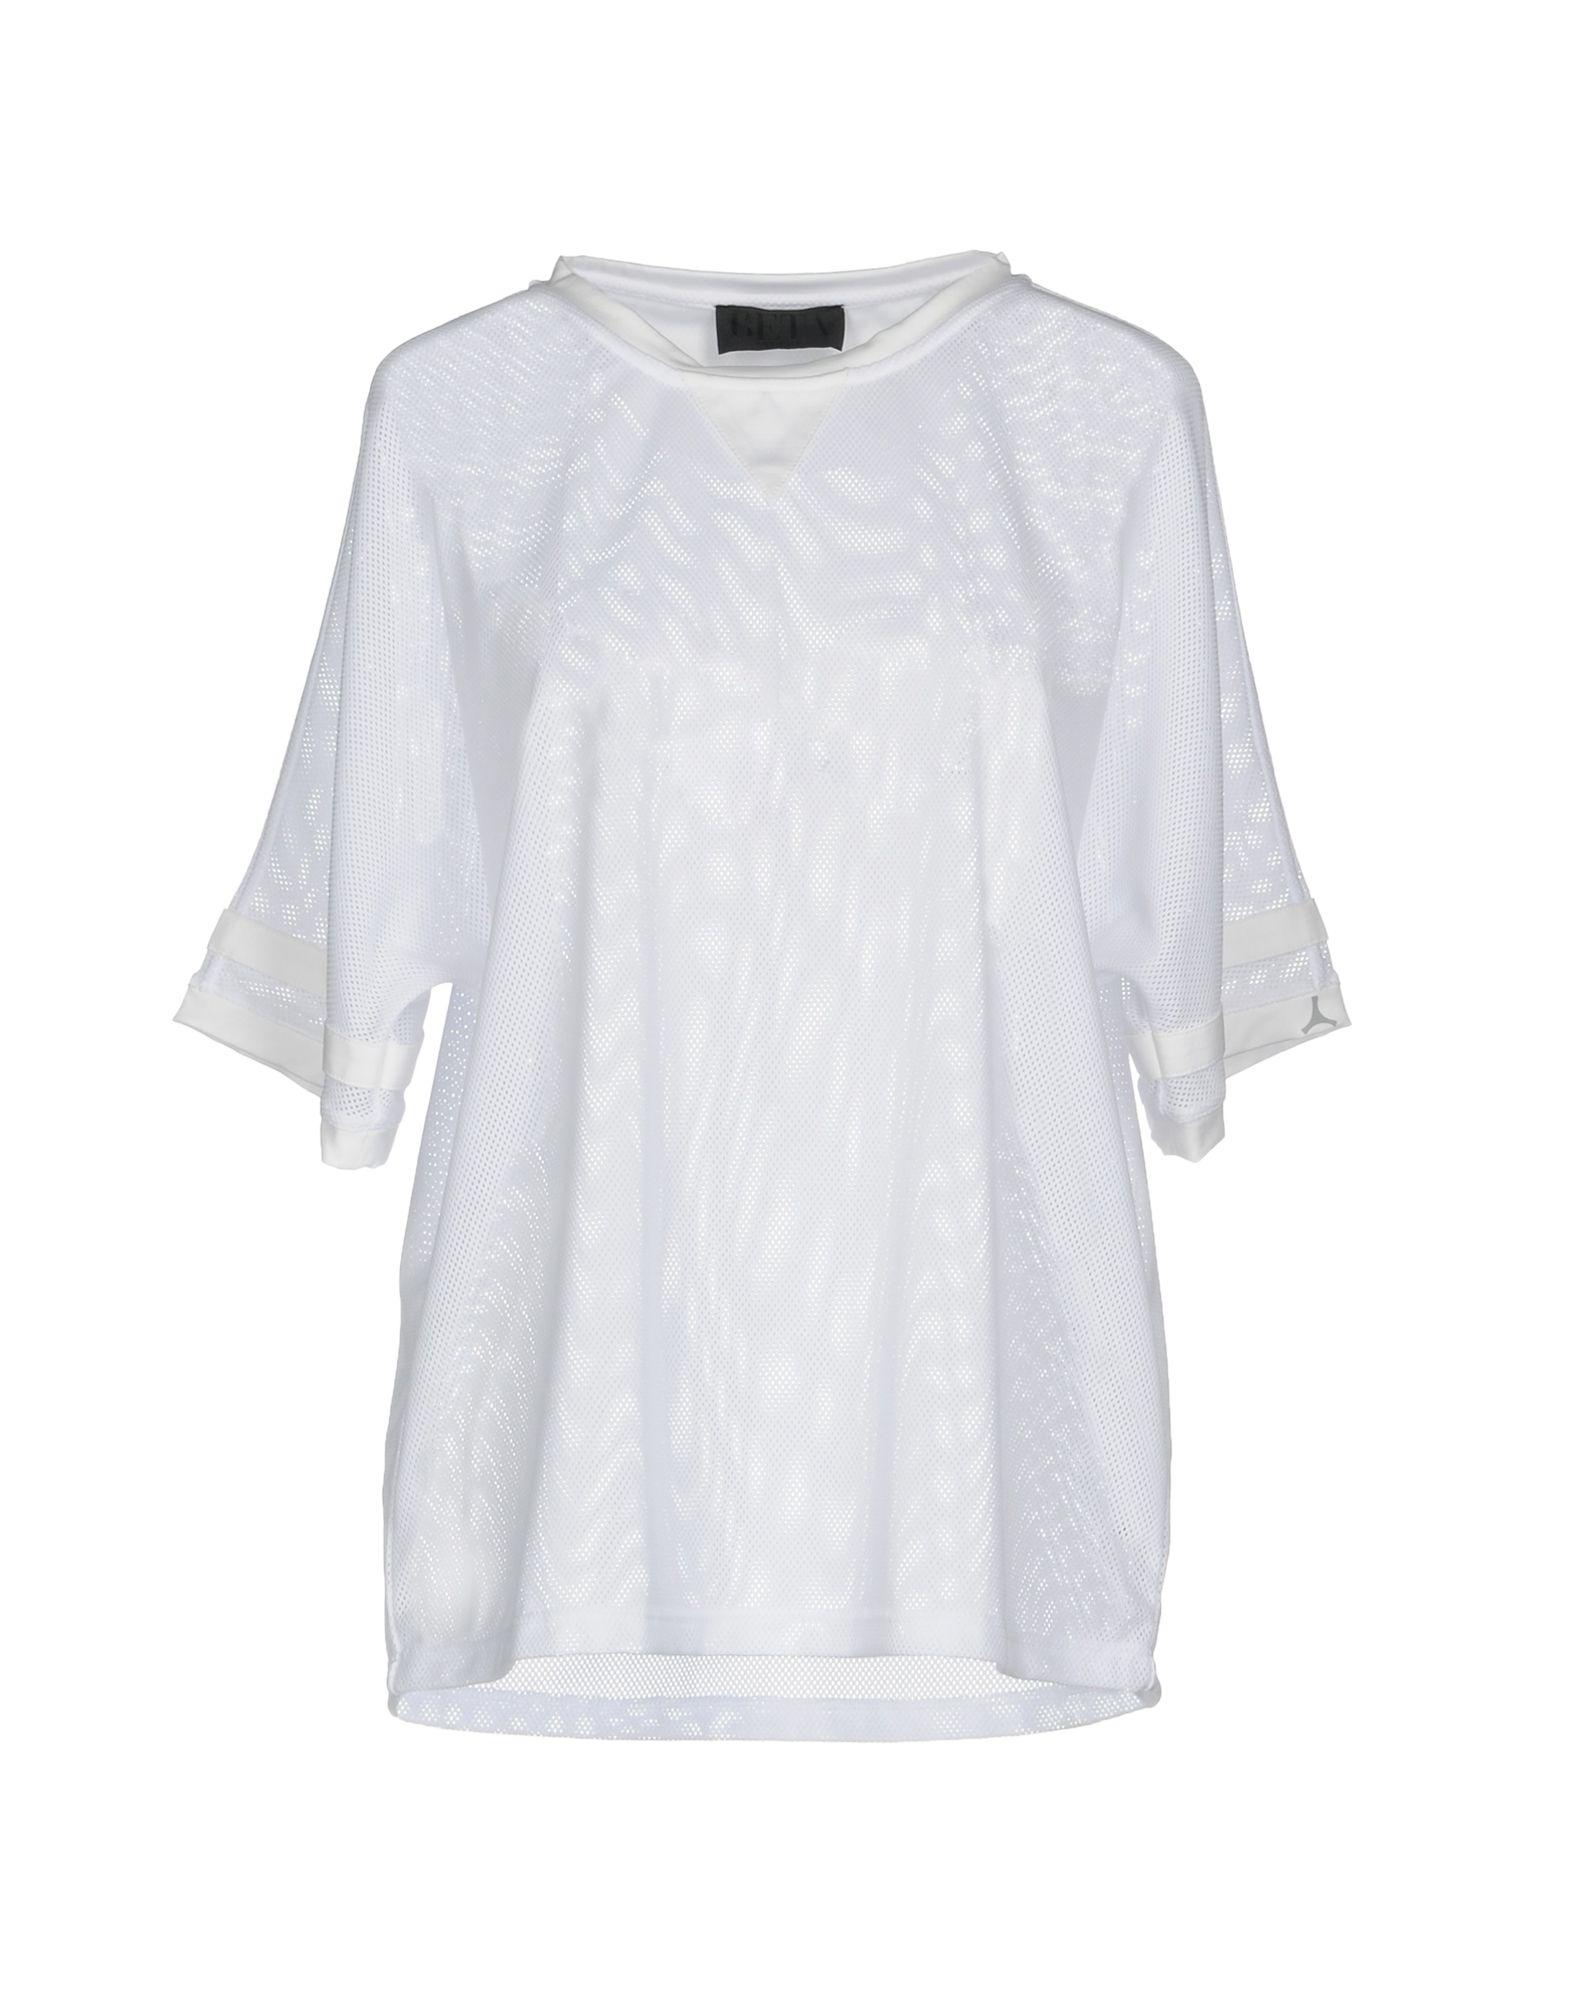 BETA STUDIOS T-Shirt in White